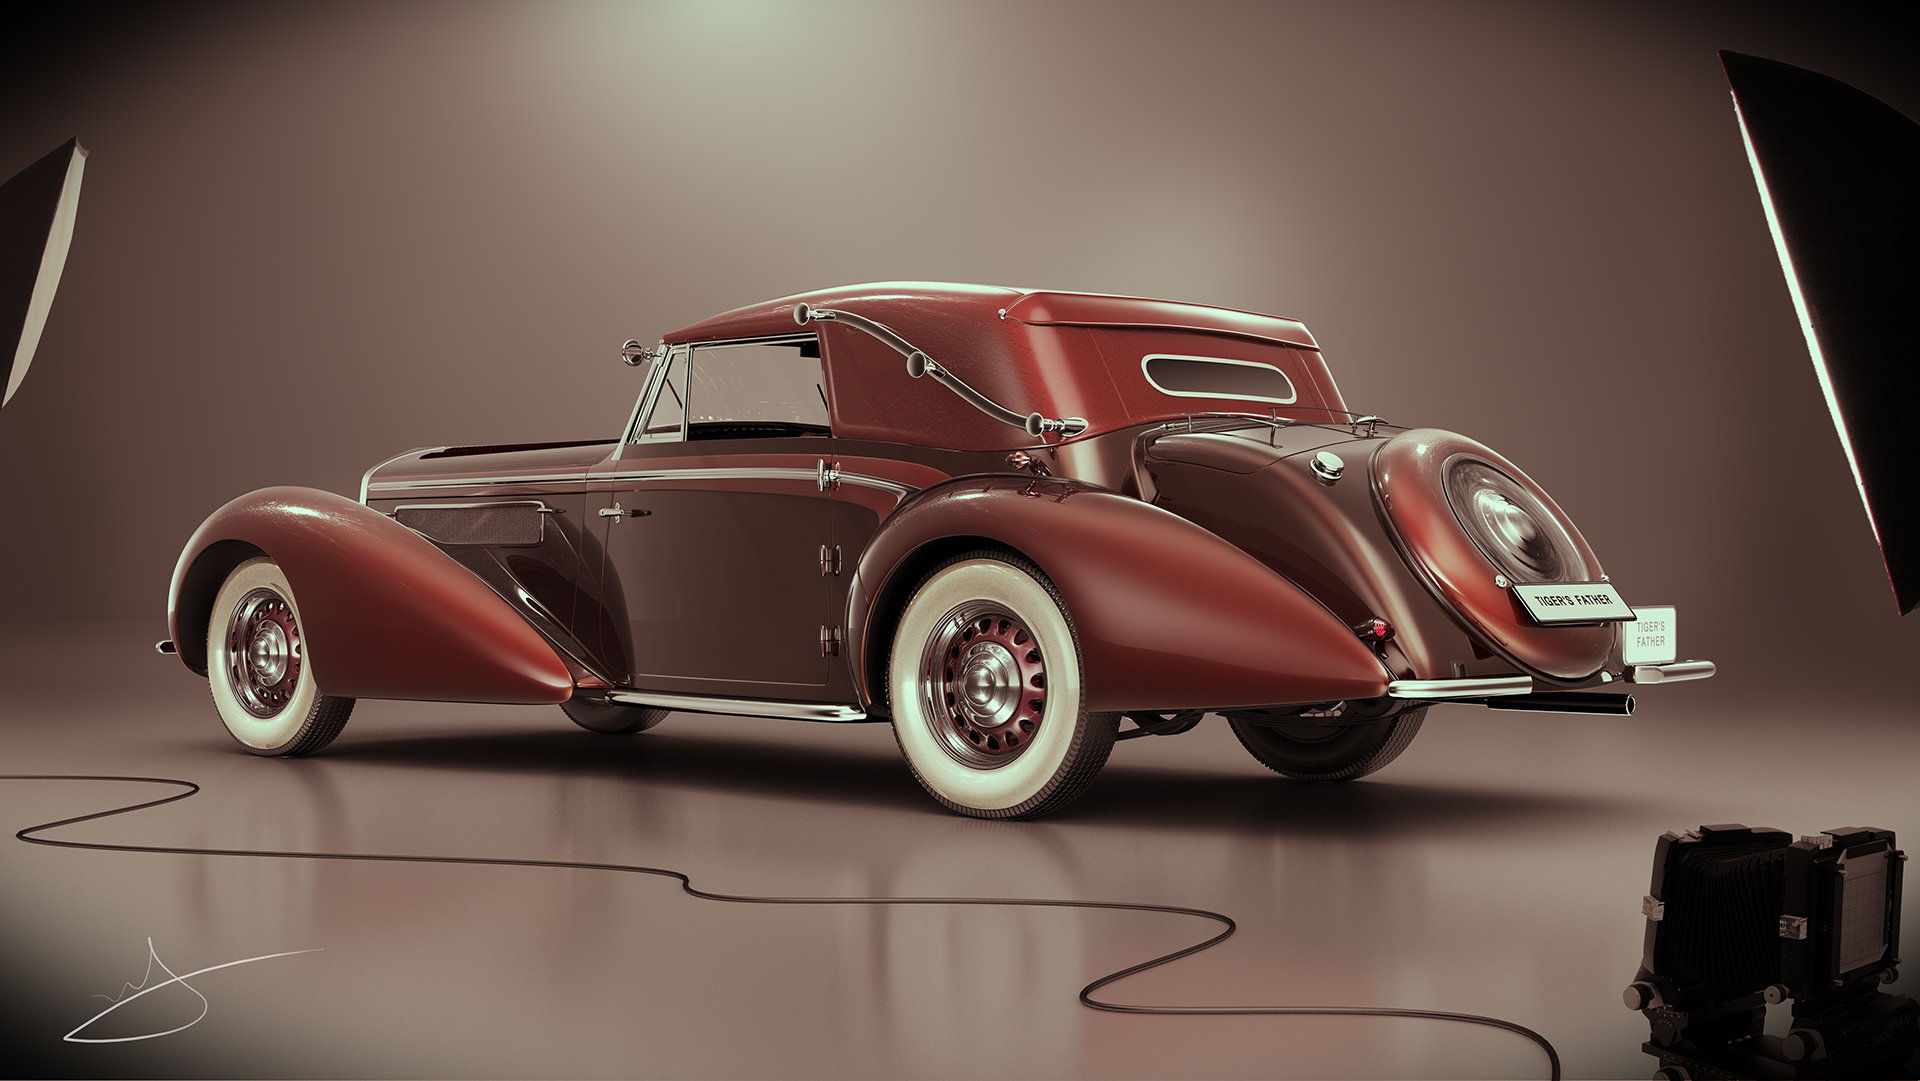 Alexandr novitskiy 1939 delage d8 120 cabriolet chapron 02